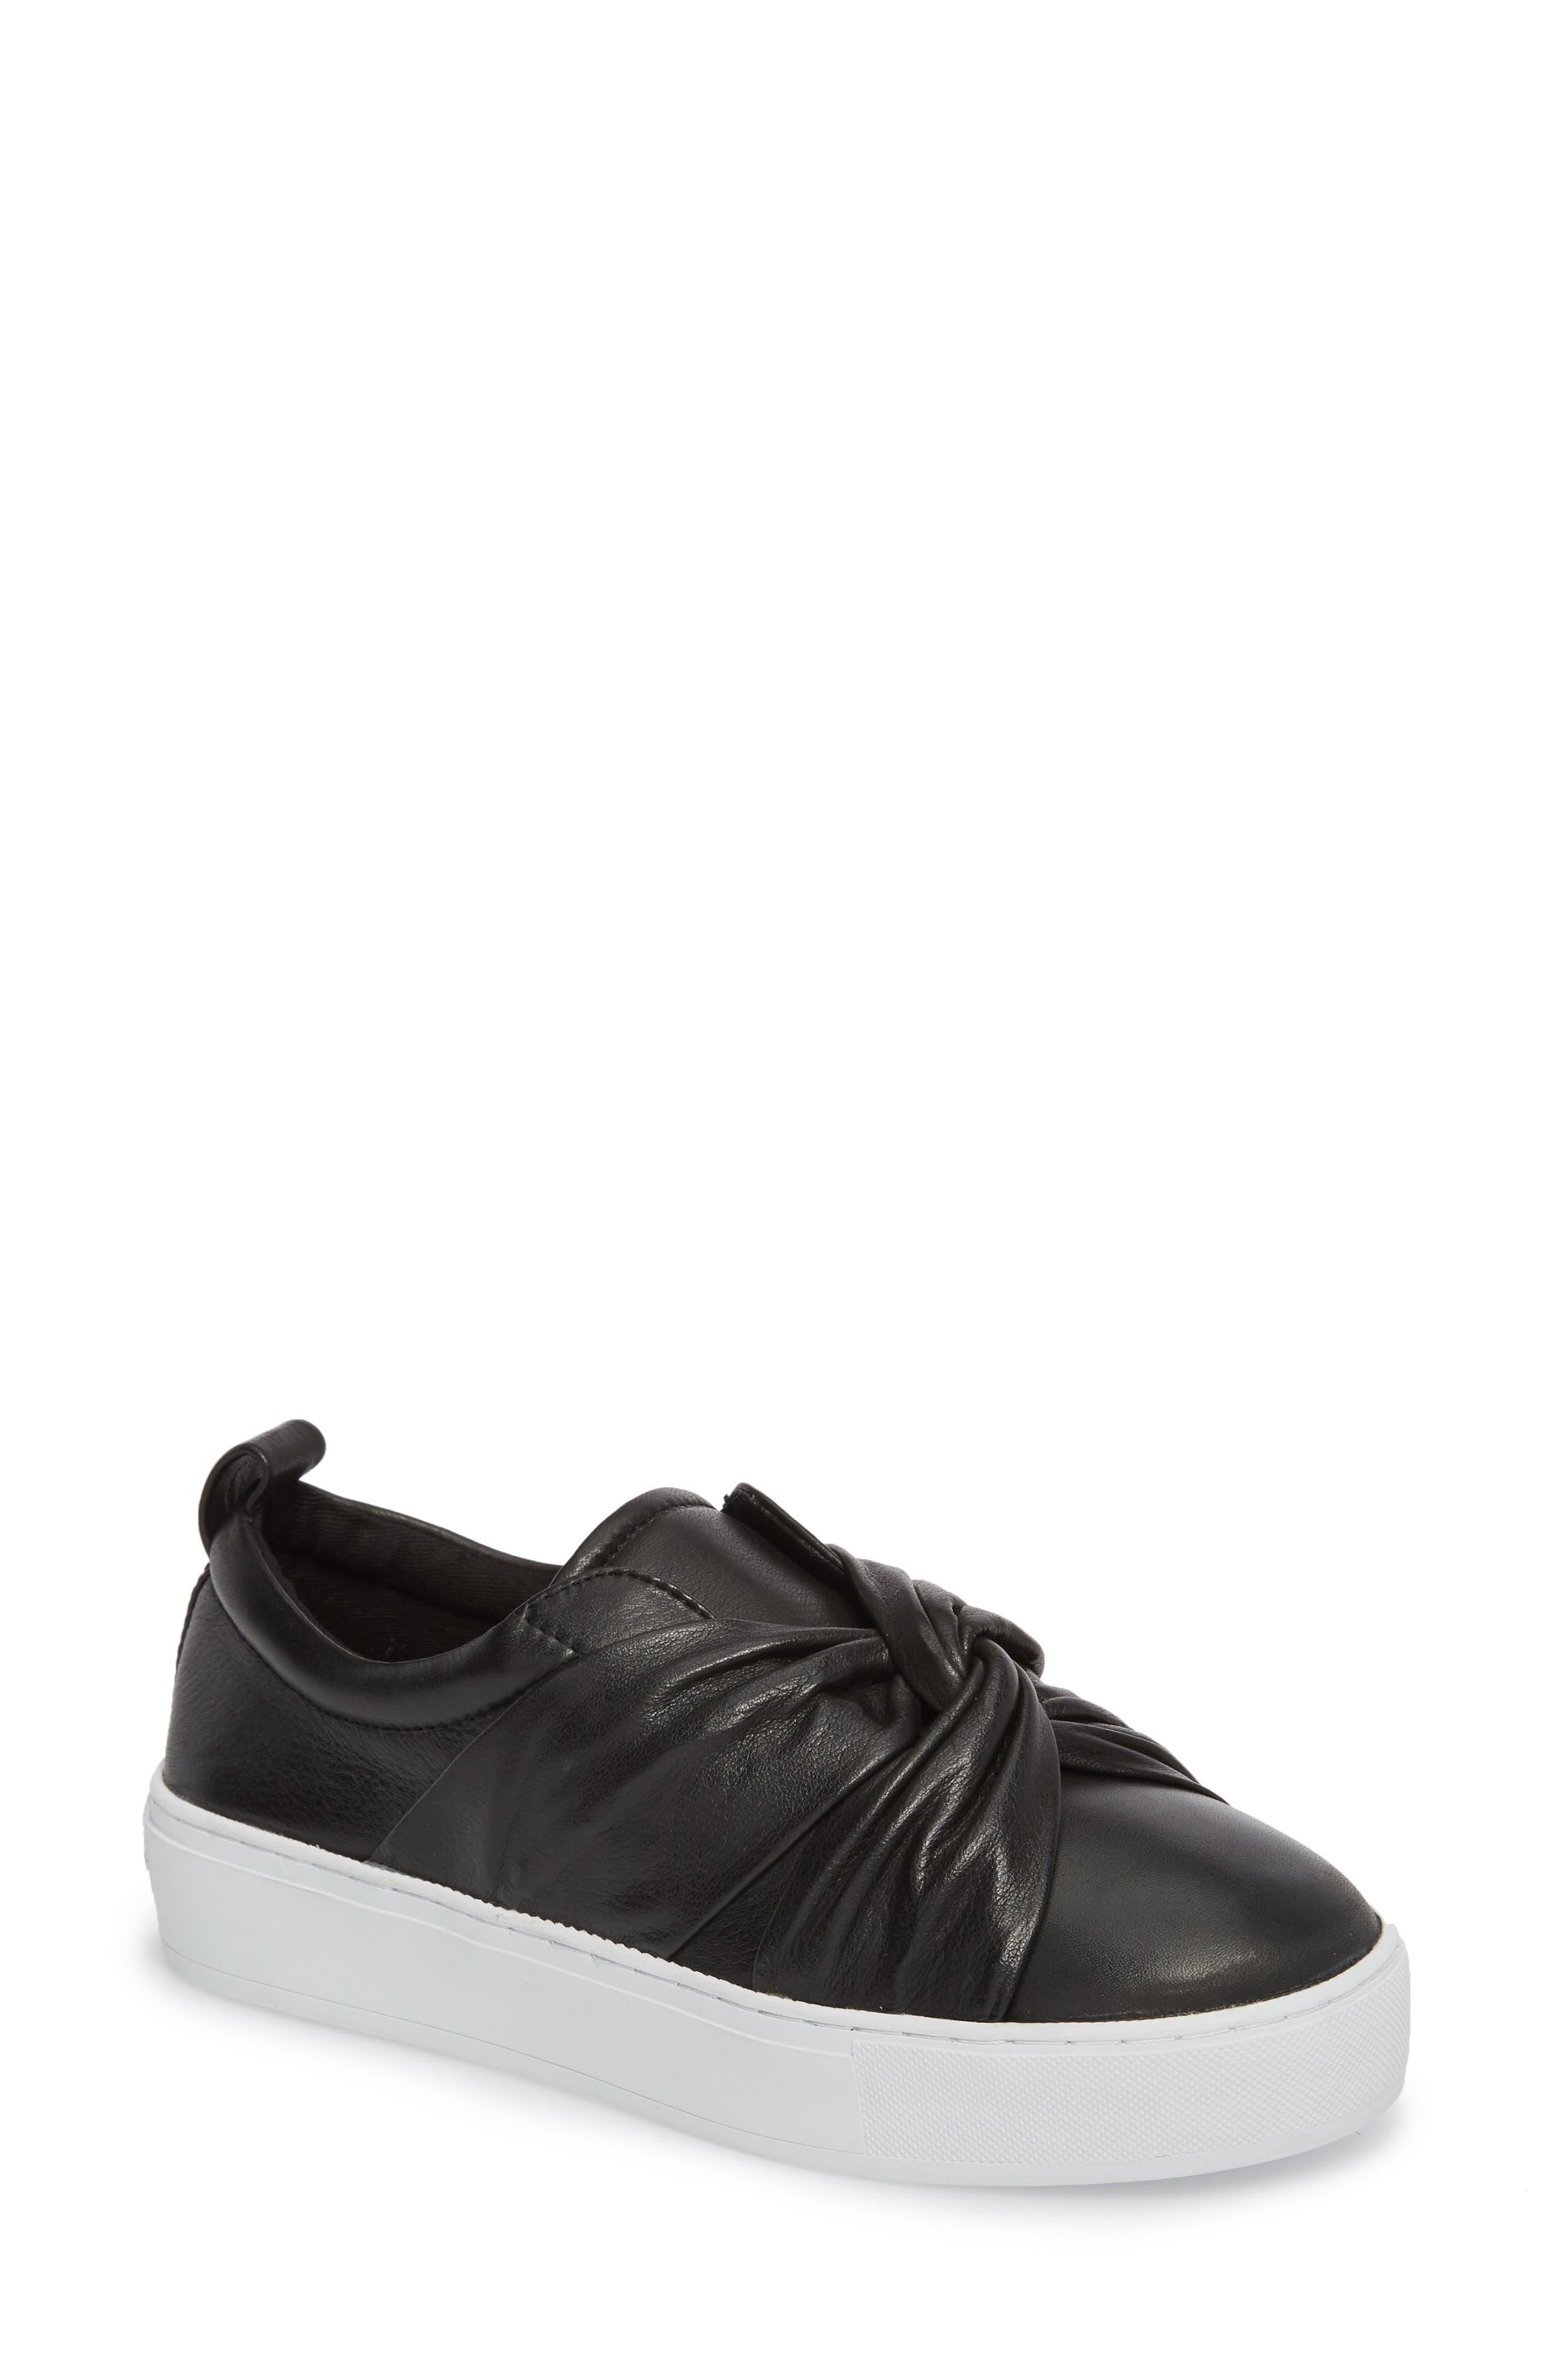 Nicole Platform Sneaker,                         Main,                         color, Black Leather